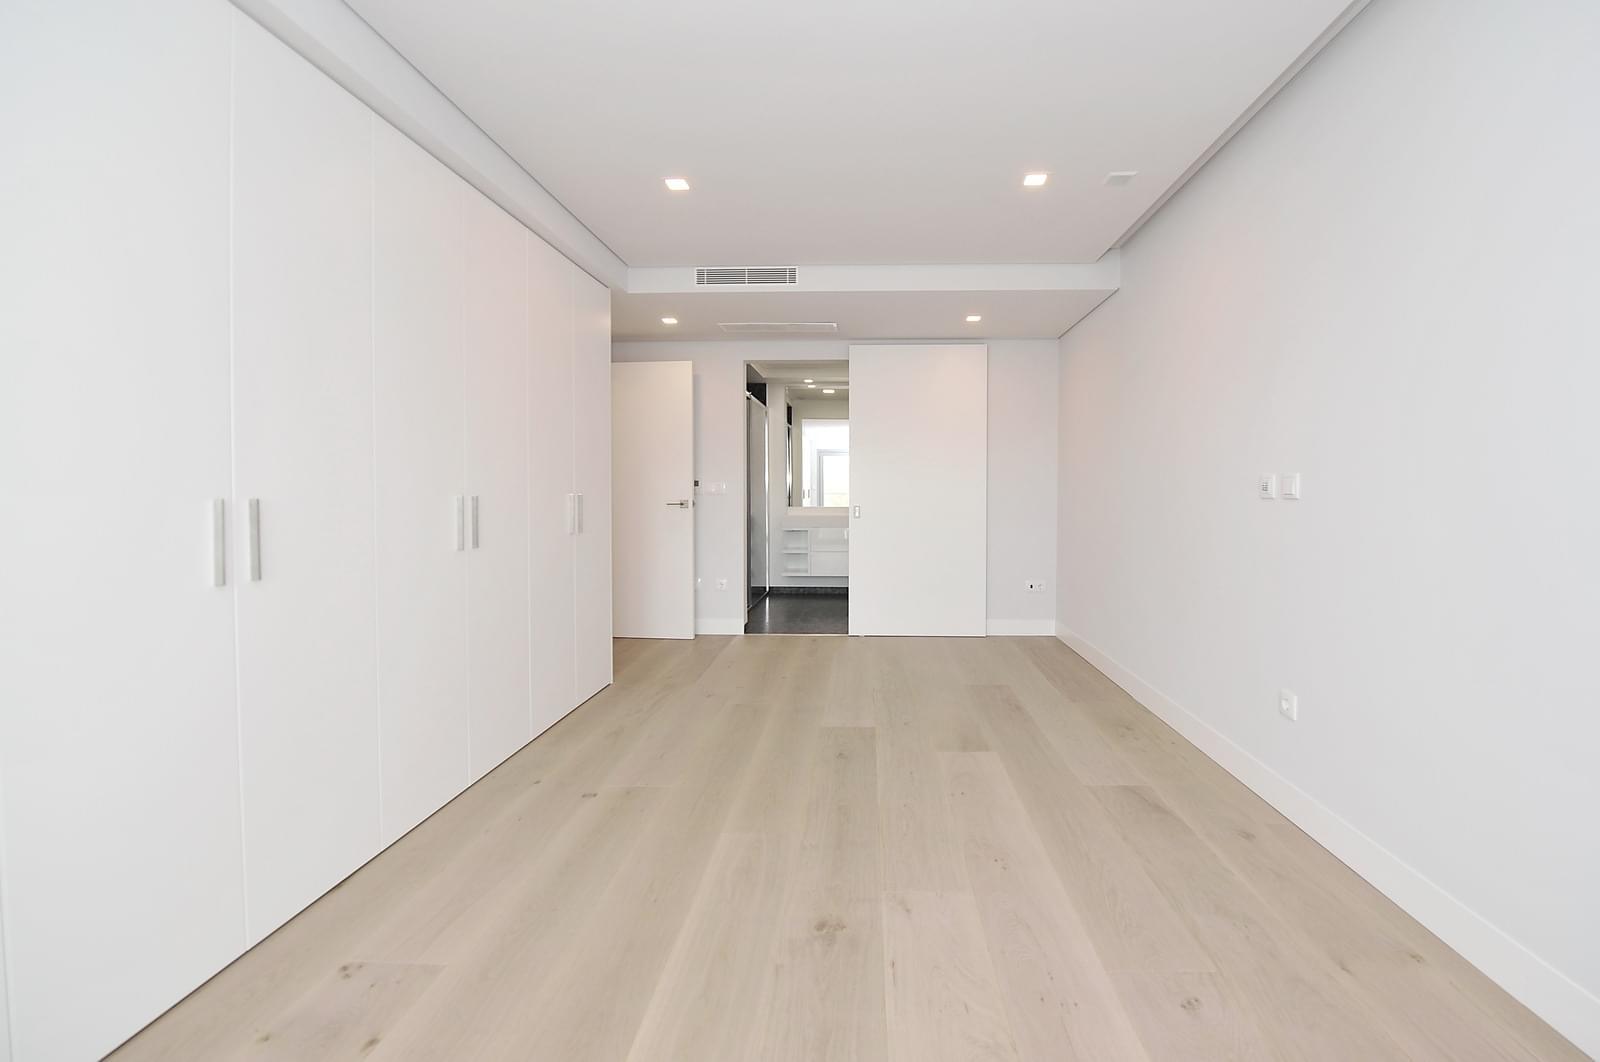 pf18989-apartamento-t4-oeiras-dc2a12b7-d38c-433d-89a8-cede7dafe415